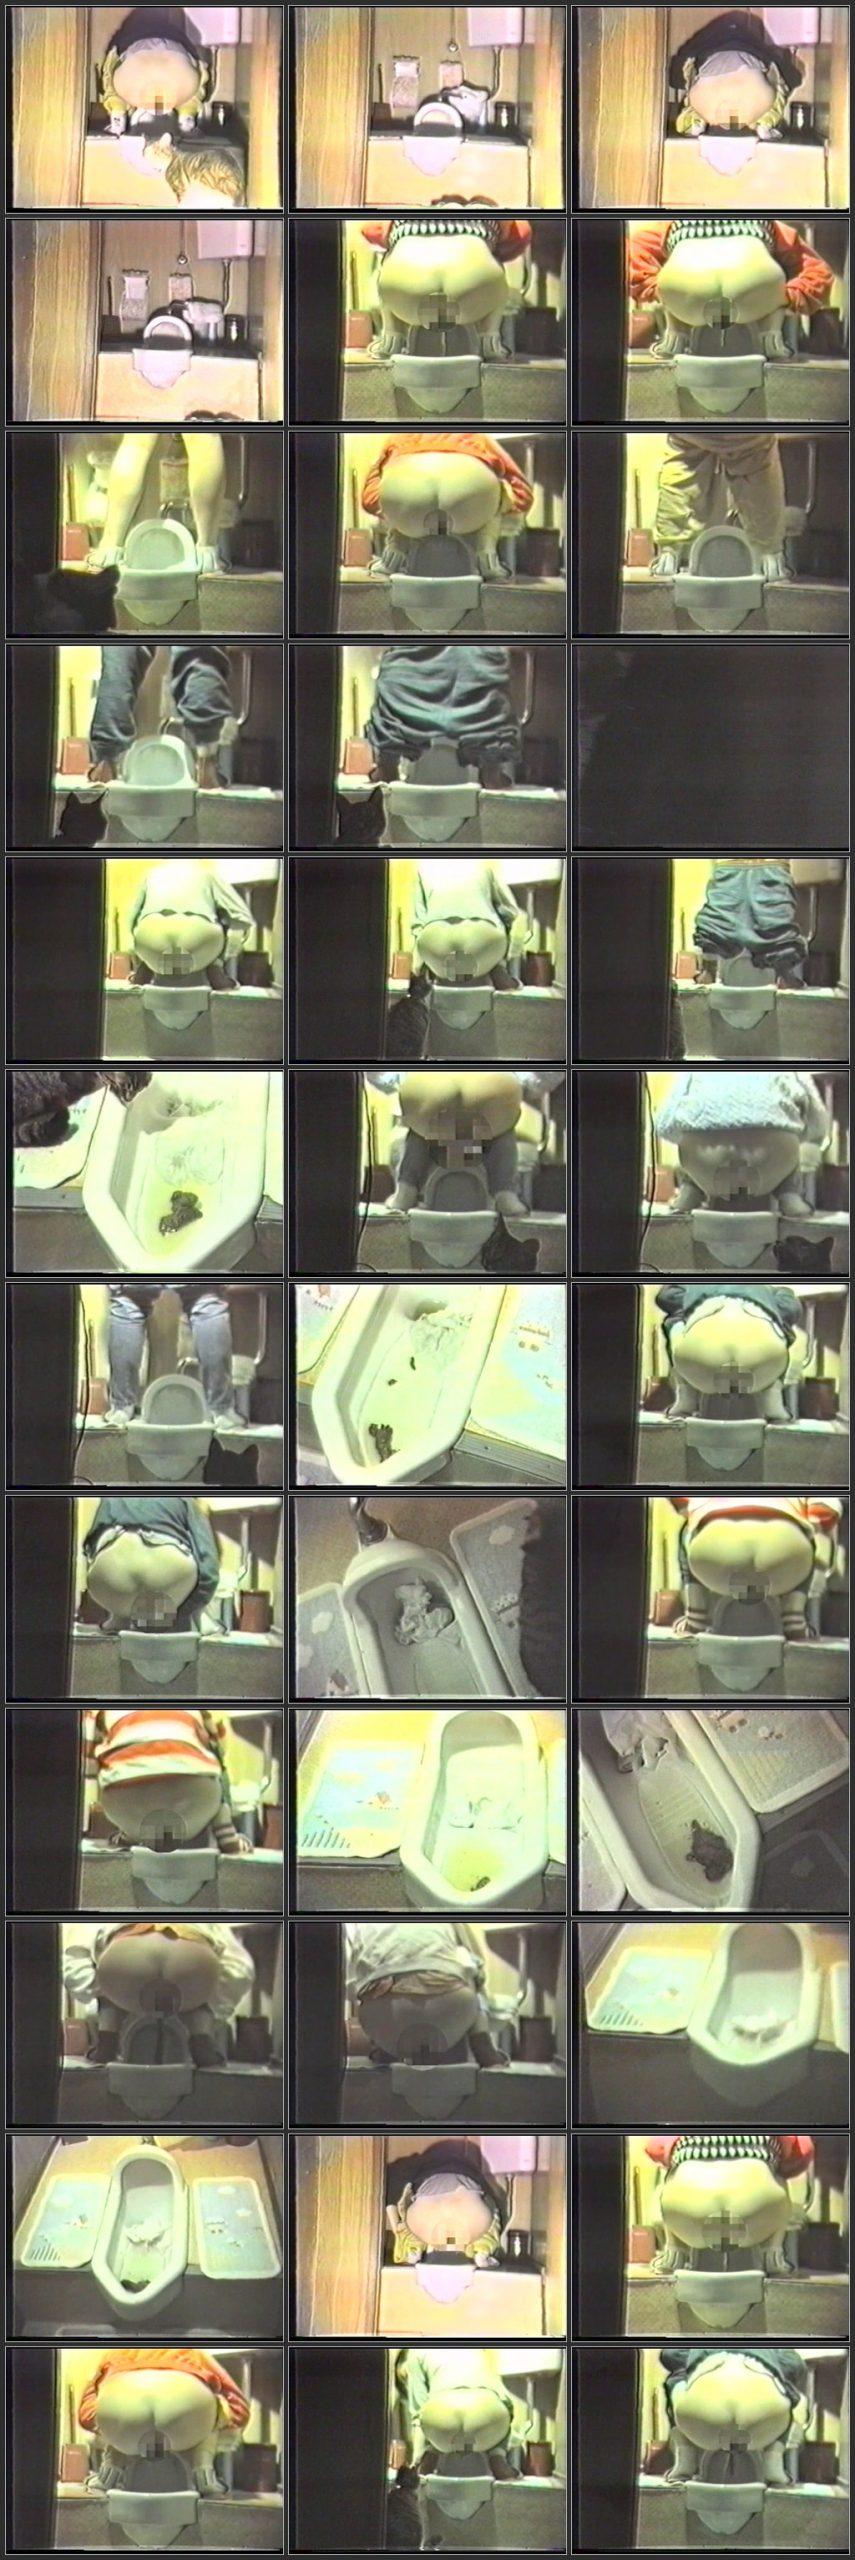 DVK 007 t scaled - [DVK-007] Toilet. アマチュア排便ビデオ智子のコンタクトトイレの日記を行うことができます Amateur